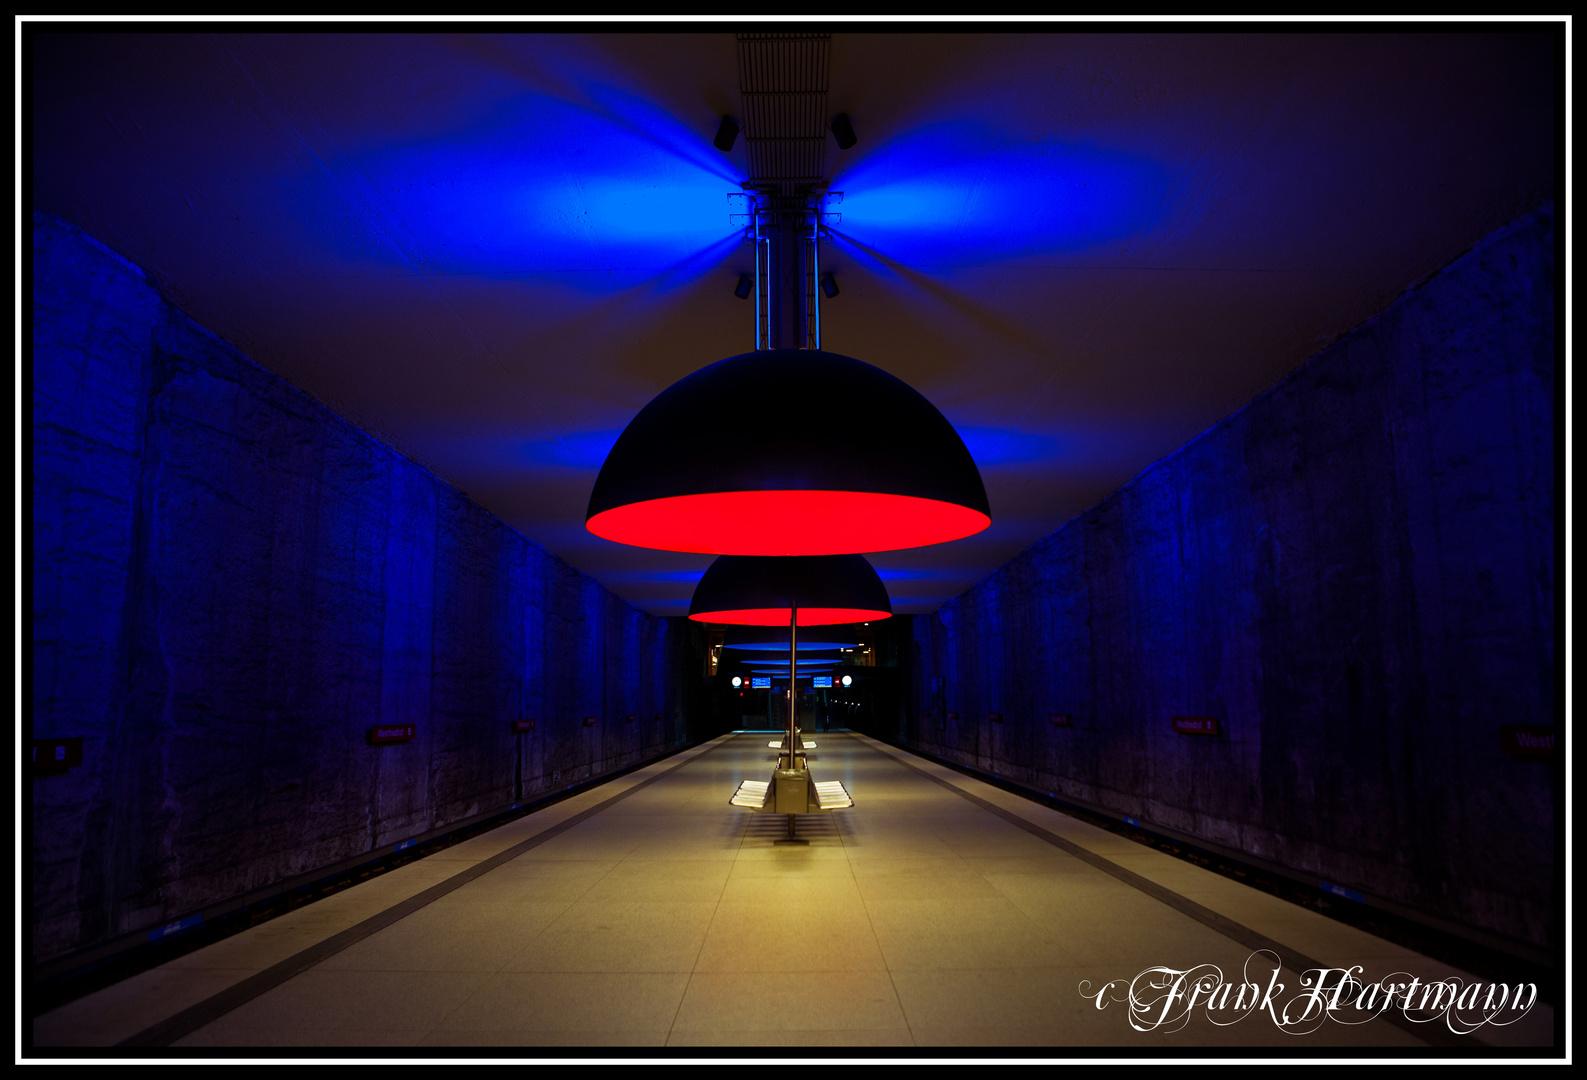 U Bahnstation Westfriedhof